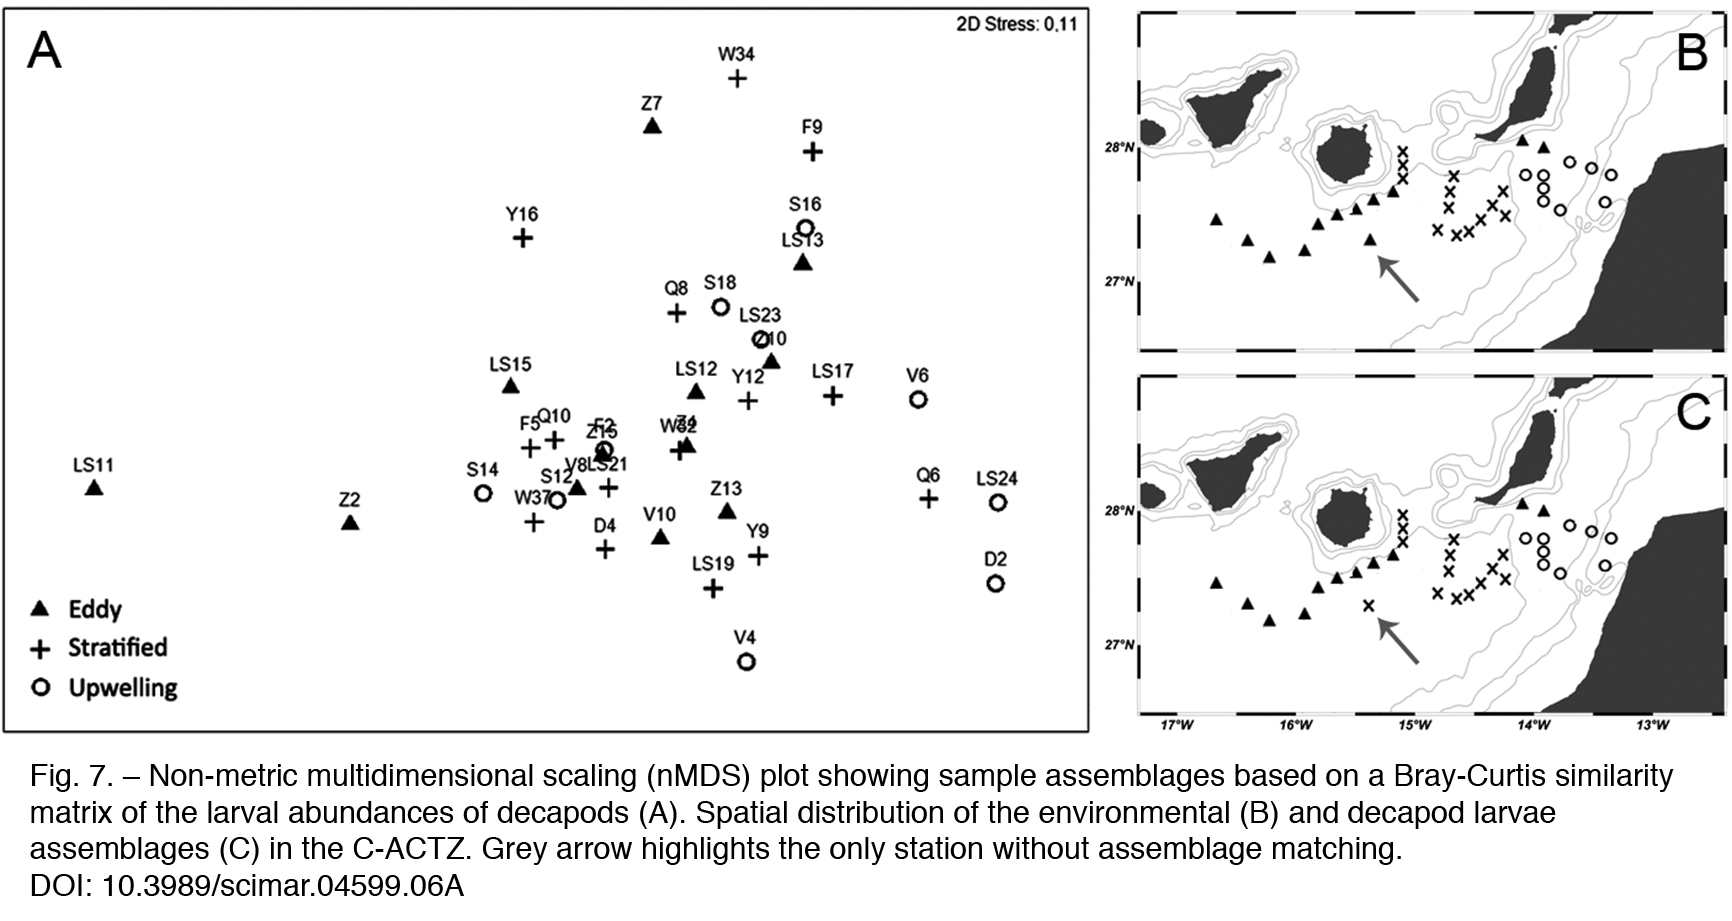 Transport pathways of decapod larvae under intense mesoscale